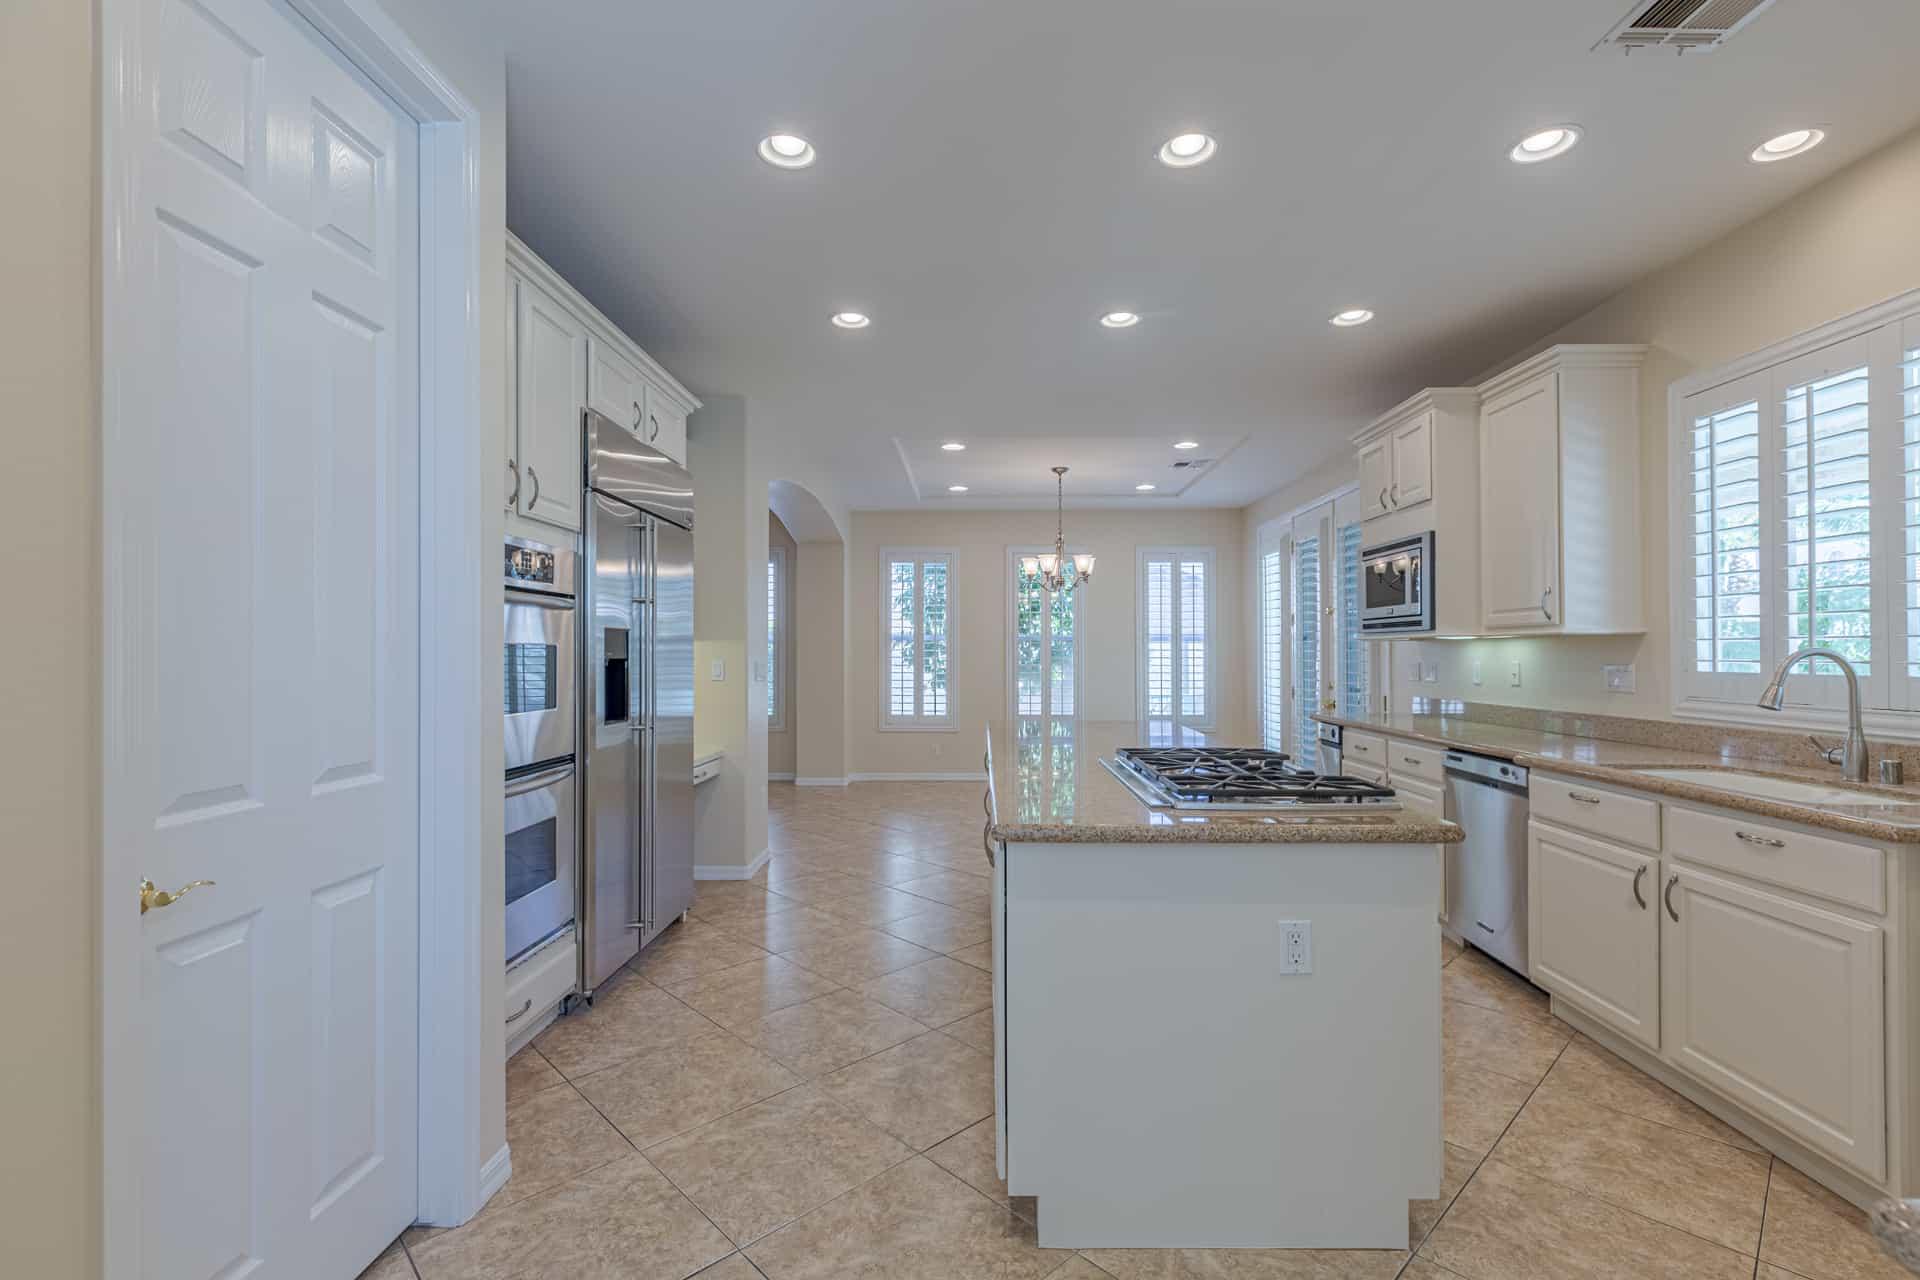 las-vegas-luxry-real-estate-realtor-rob-jensen-company-10729-grey-havens-court-willow-creek1357